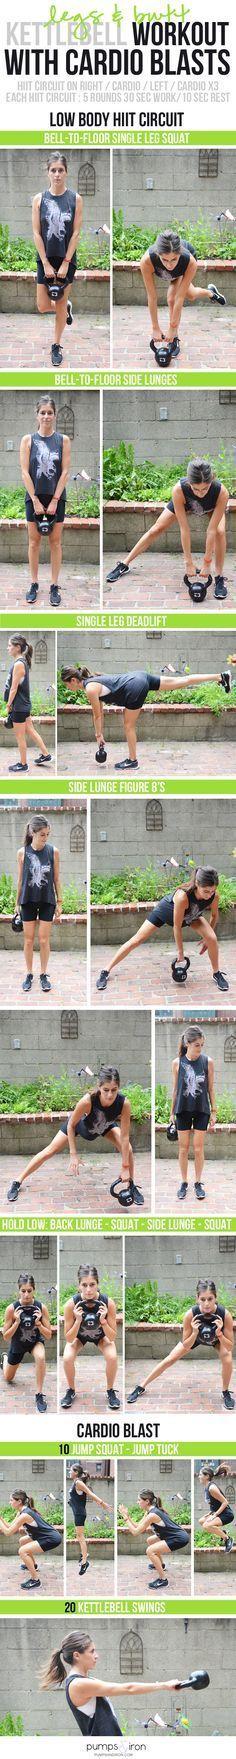 Butt & Legs Kettlebell Workout with Cardio | Posted By: CustomWeightLossProgram.com